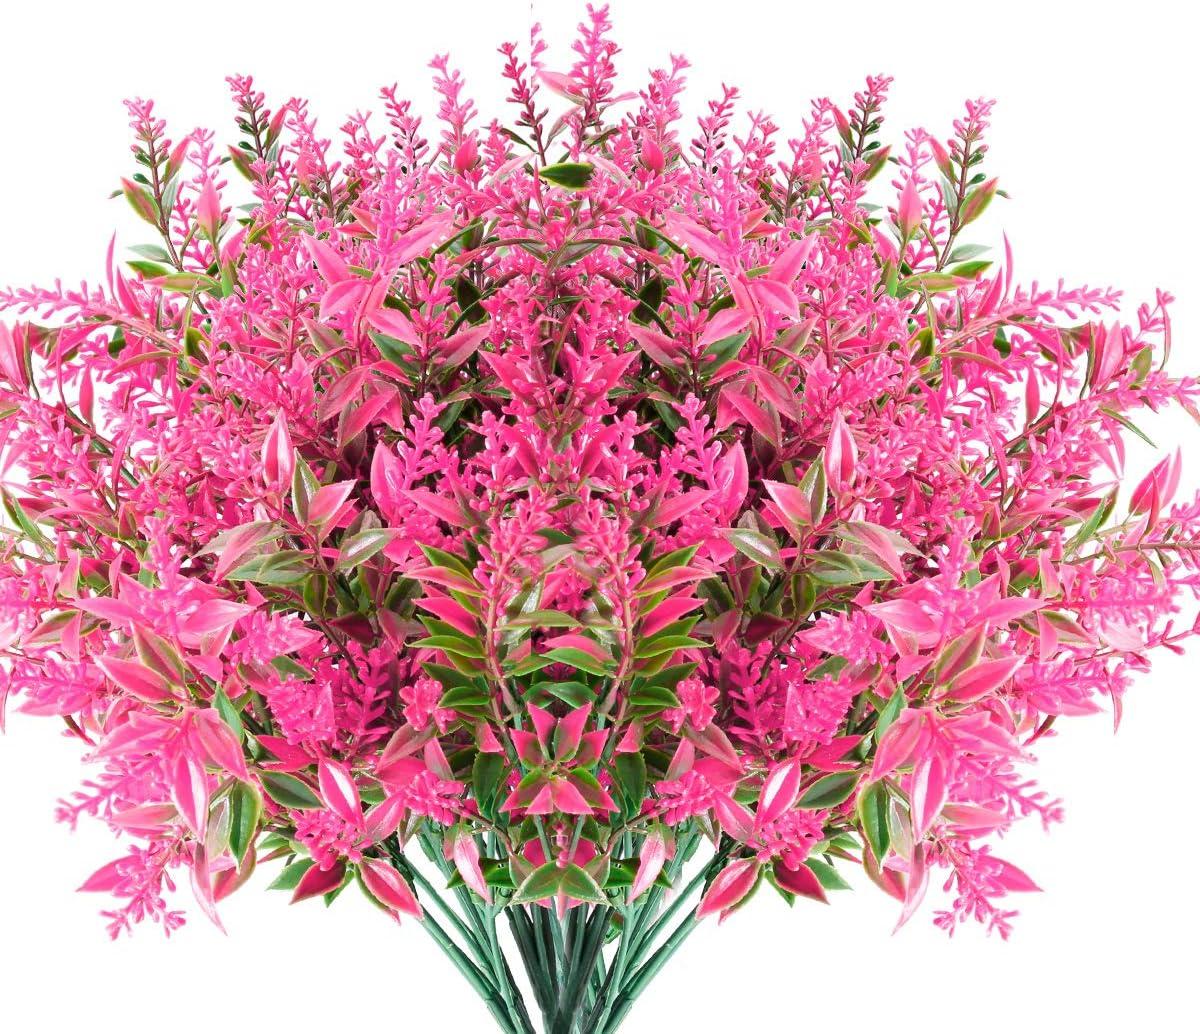 JEMONG 8 Bundles Artificial Lavender Flowers Outdoor UV Resistant Fake Flowers No Fade Faux Plastic Plants Garden Porch Window Box Decorating (Pink)